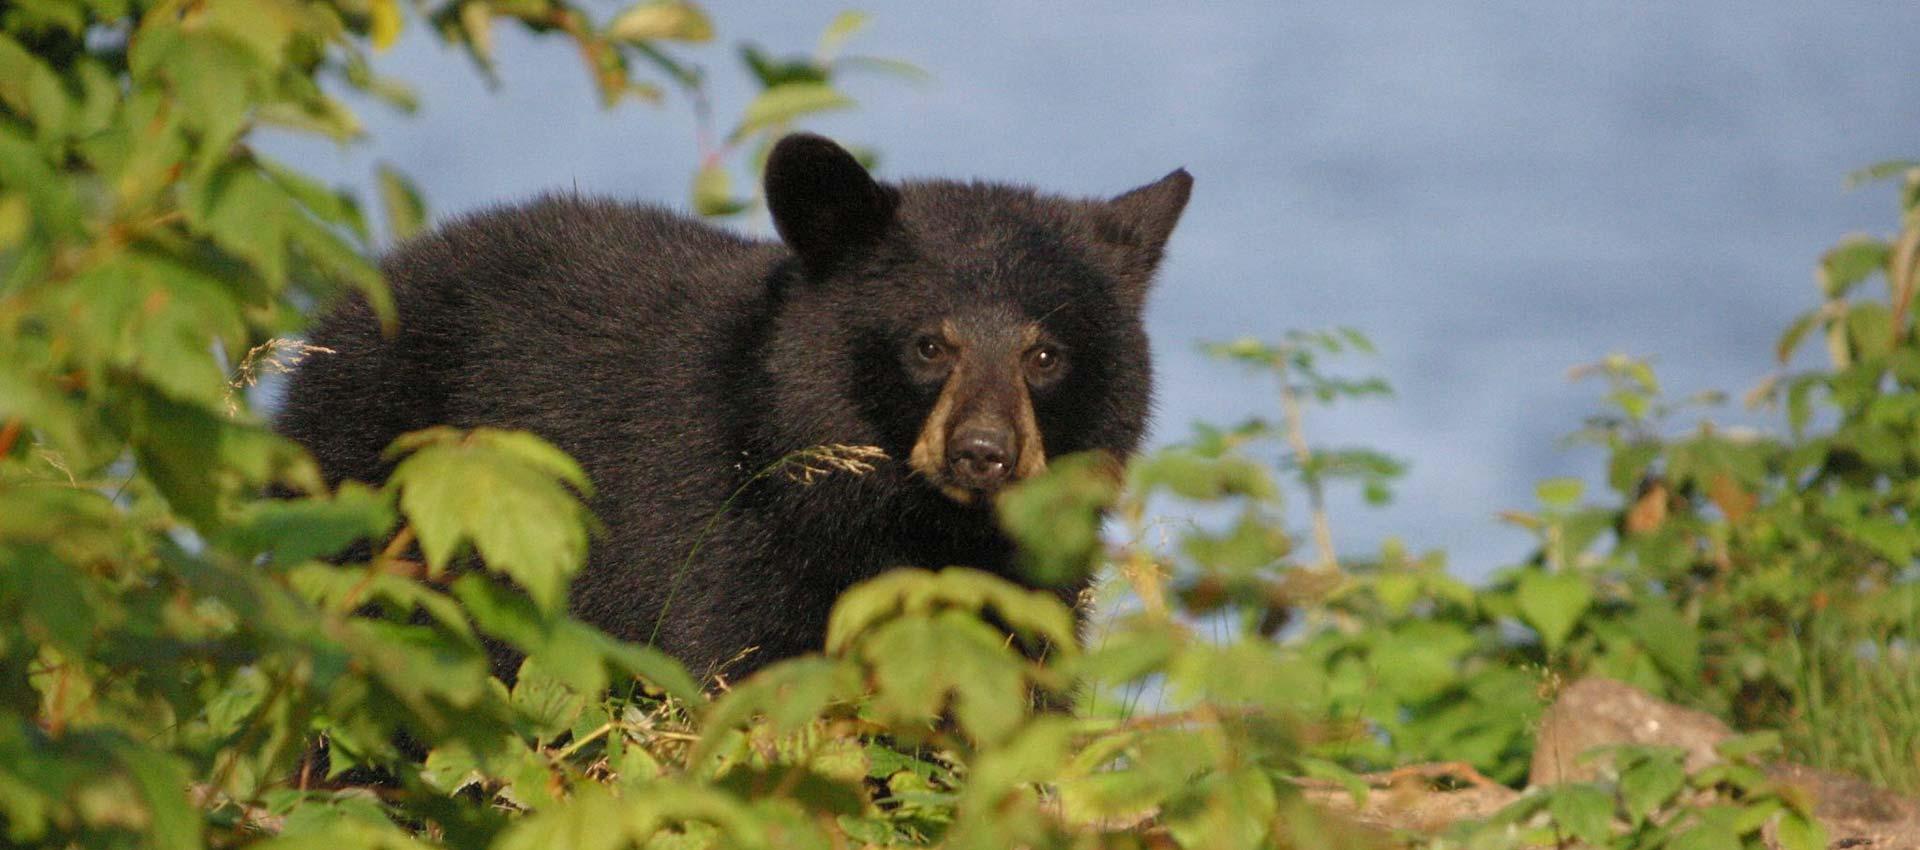 erringtons-nature-wildlife